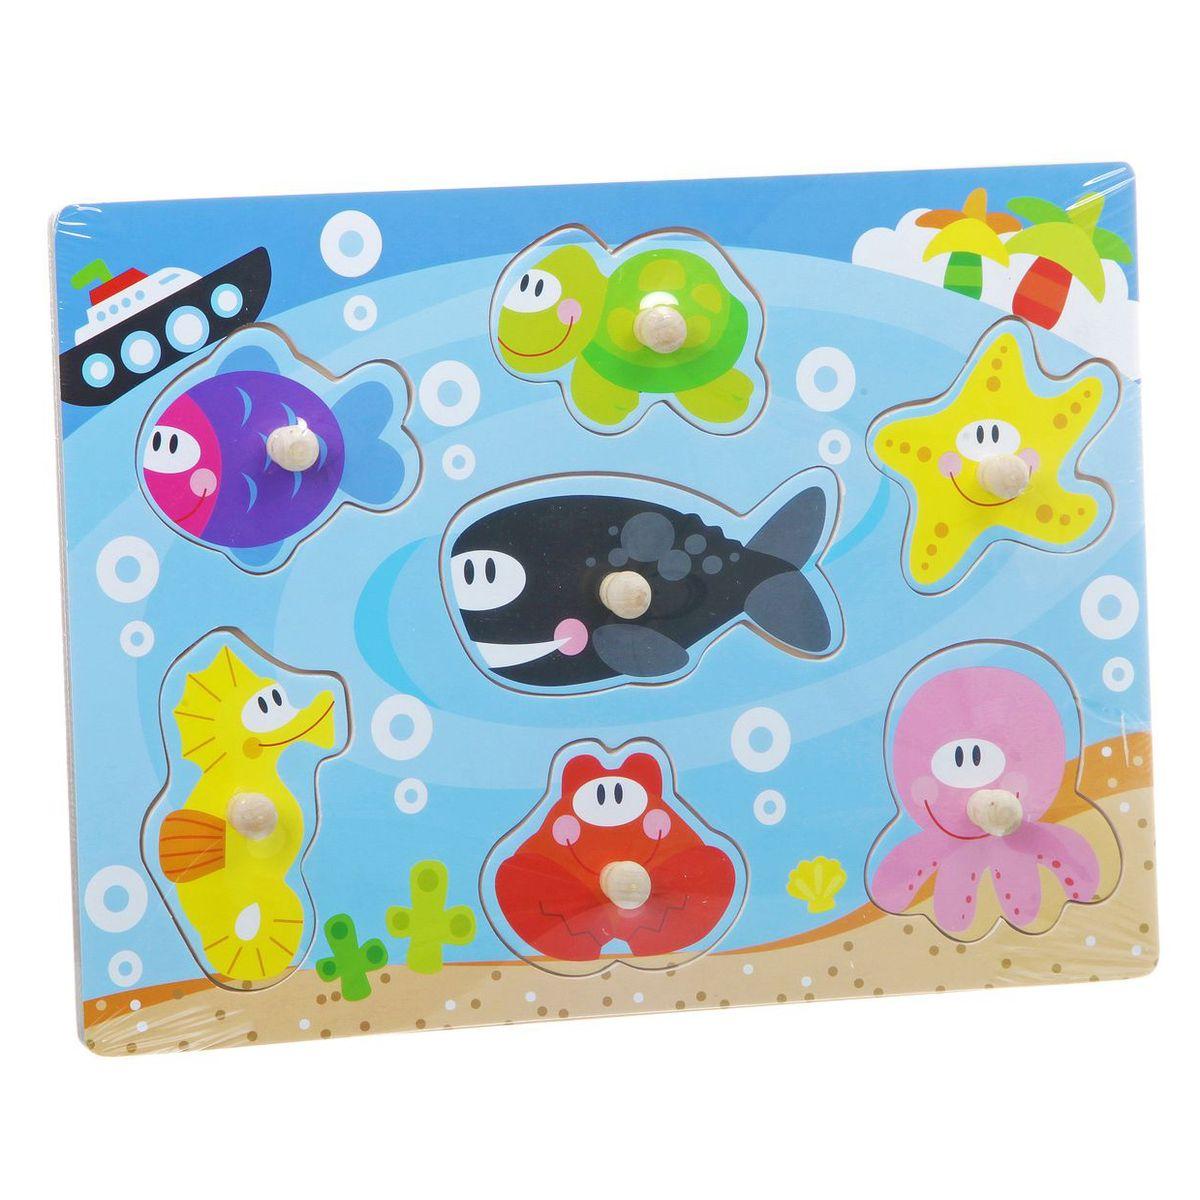 Bondibon Пазл для малышей Подводный мир bondibon пазл для малышей подводный мир